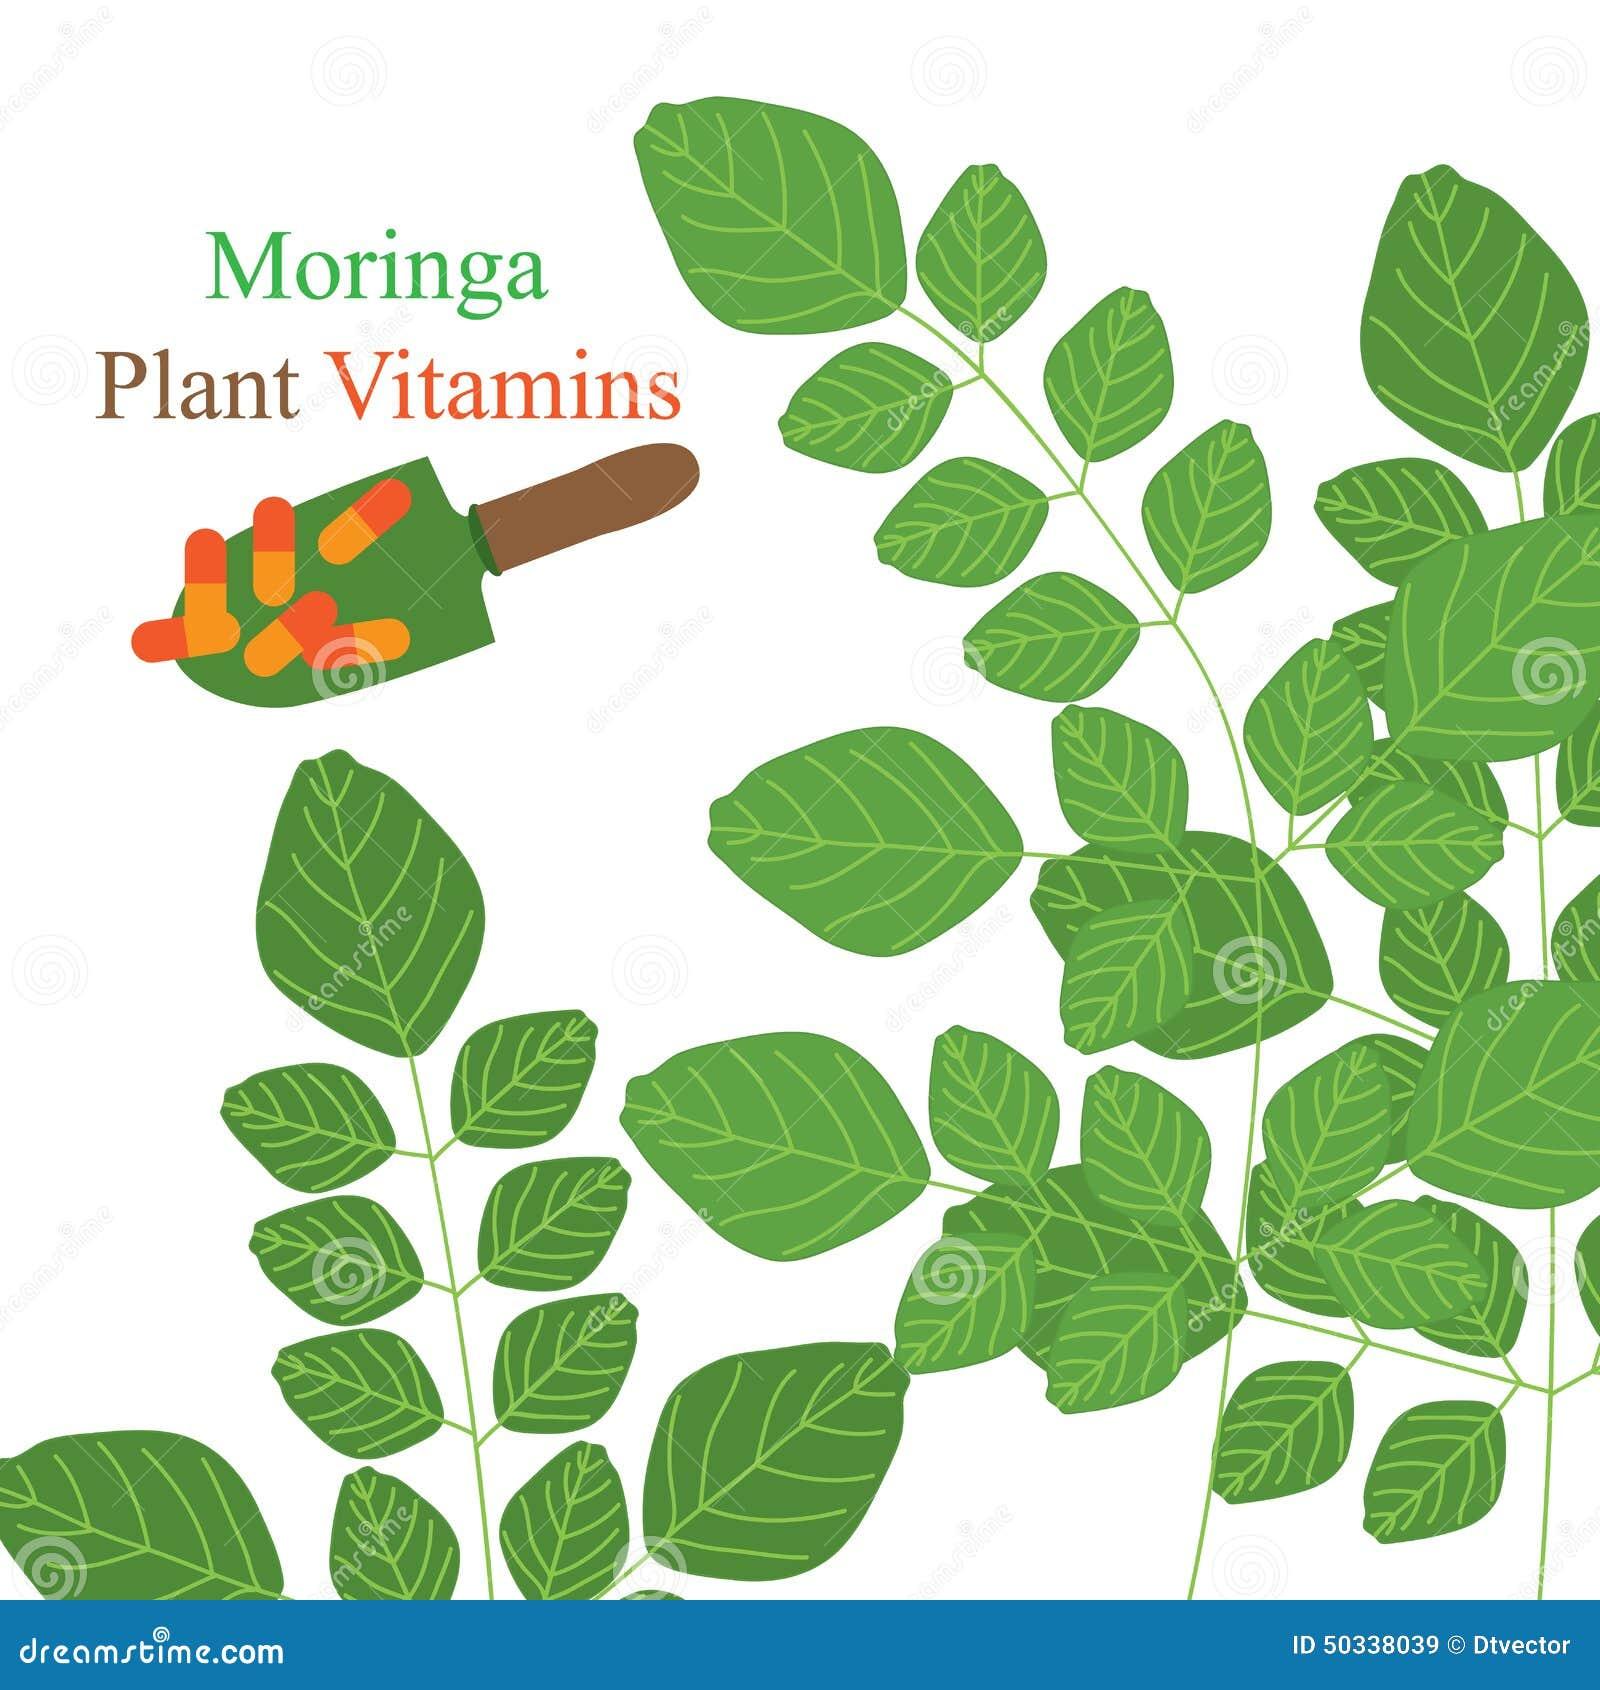 Moringa plant vitamins